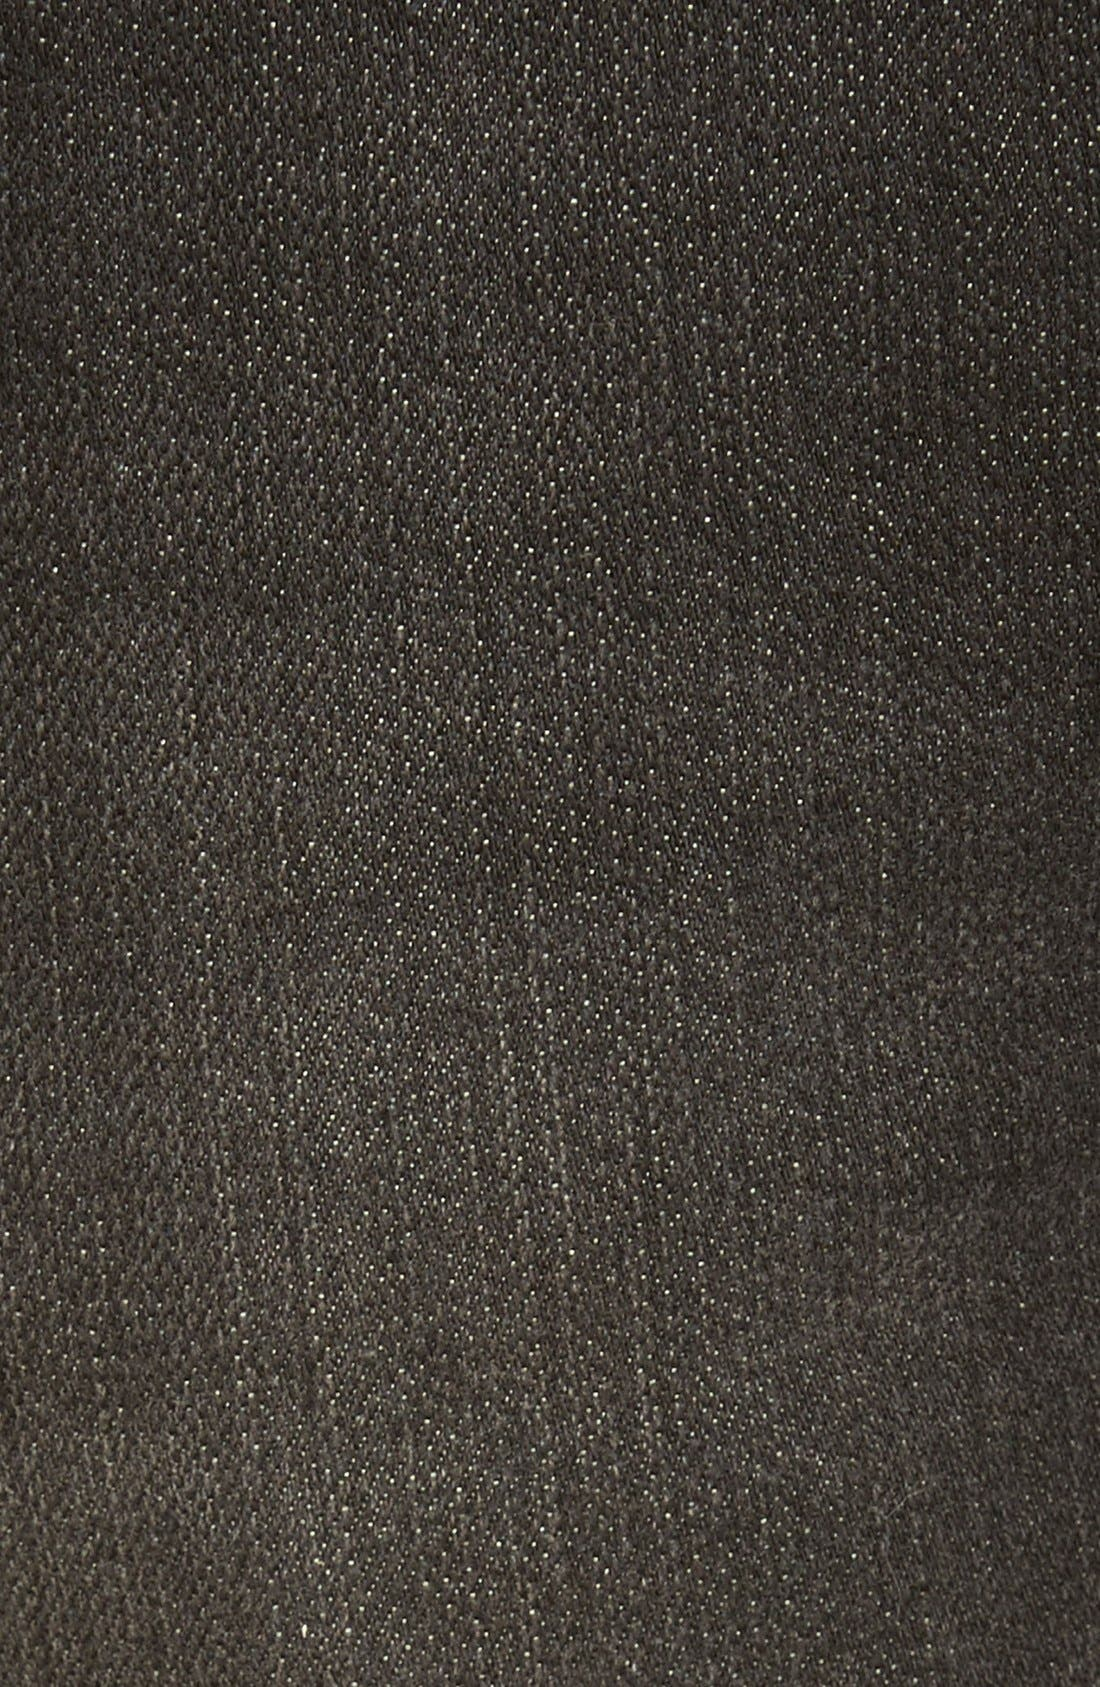 'Duke' Relaxed Fit Jeans,                             Alternate thumbnail 5, color,                             002